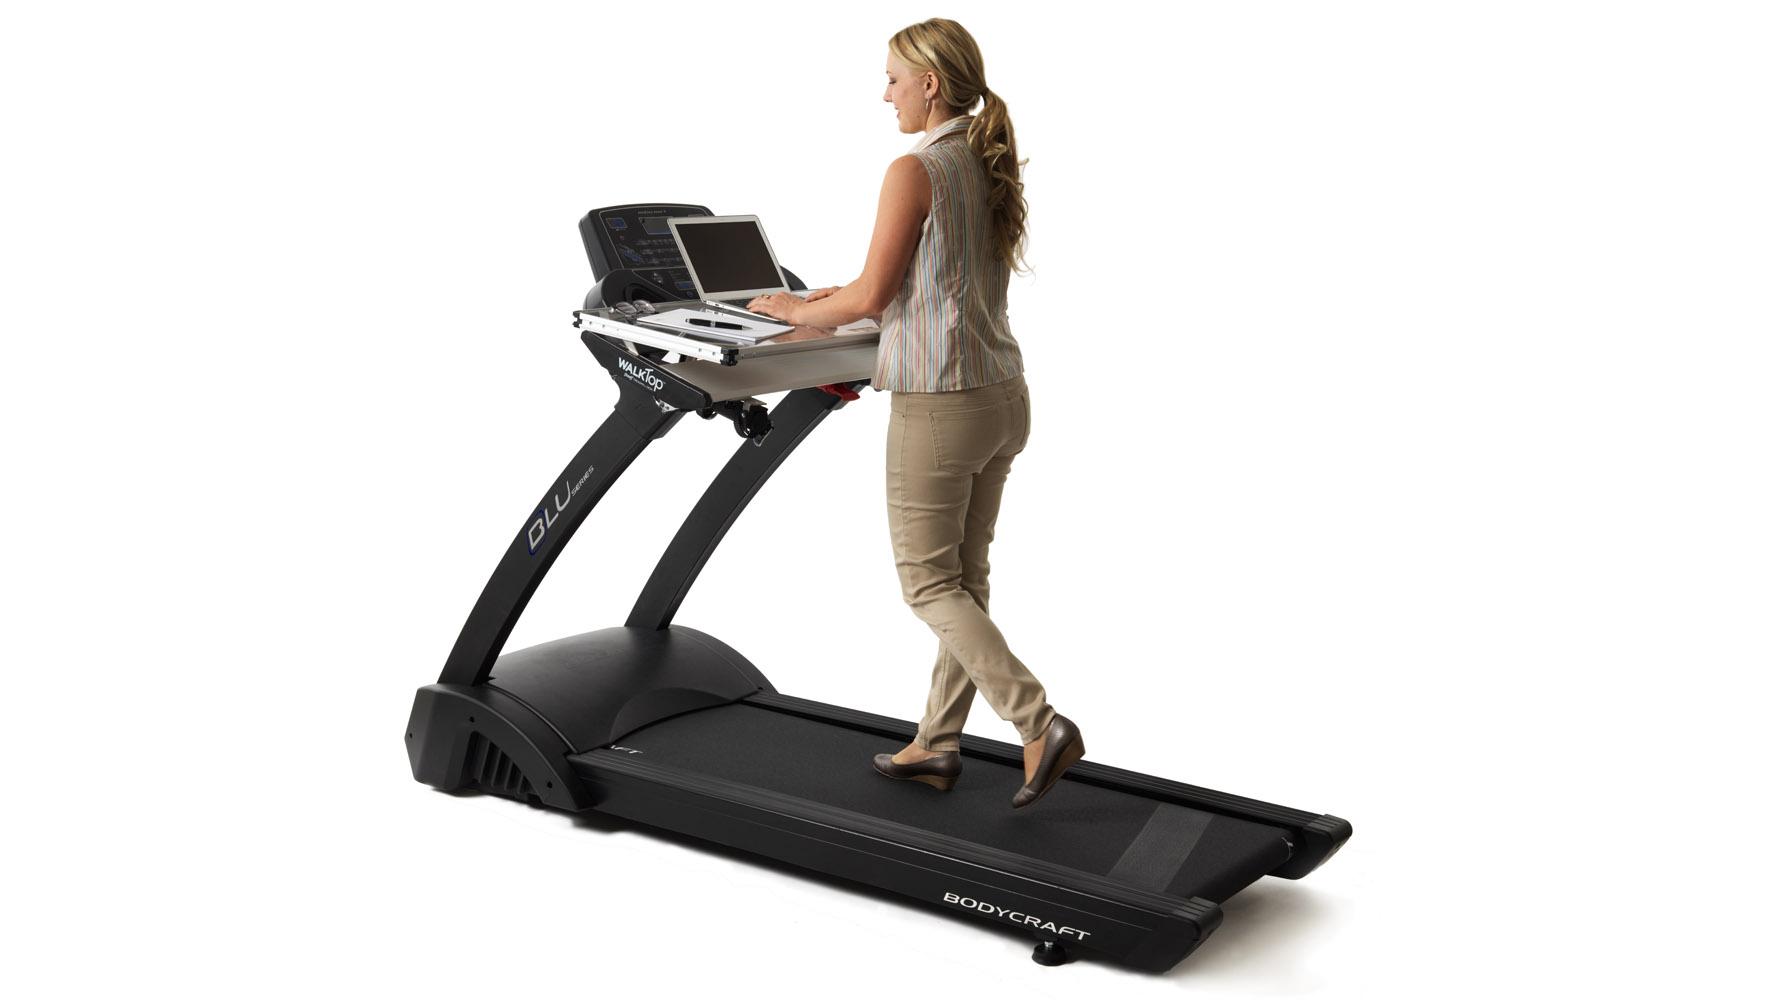 WalkTop Treadmill Desk With Quick Release